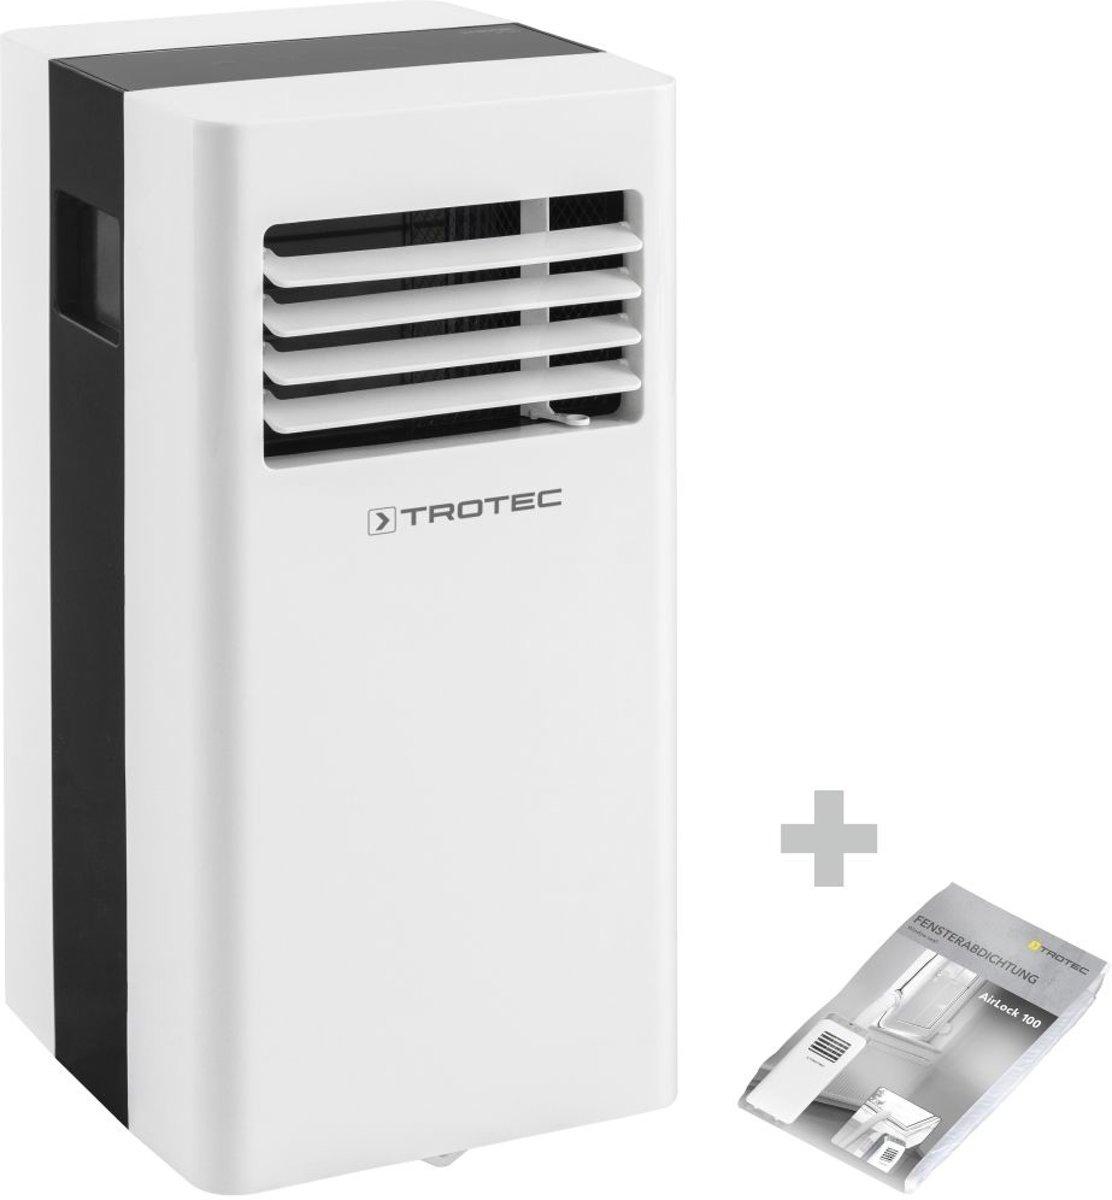 TROTEC Mobiele airco PAC 2100 X & AirLock 100 kopen